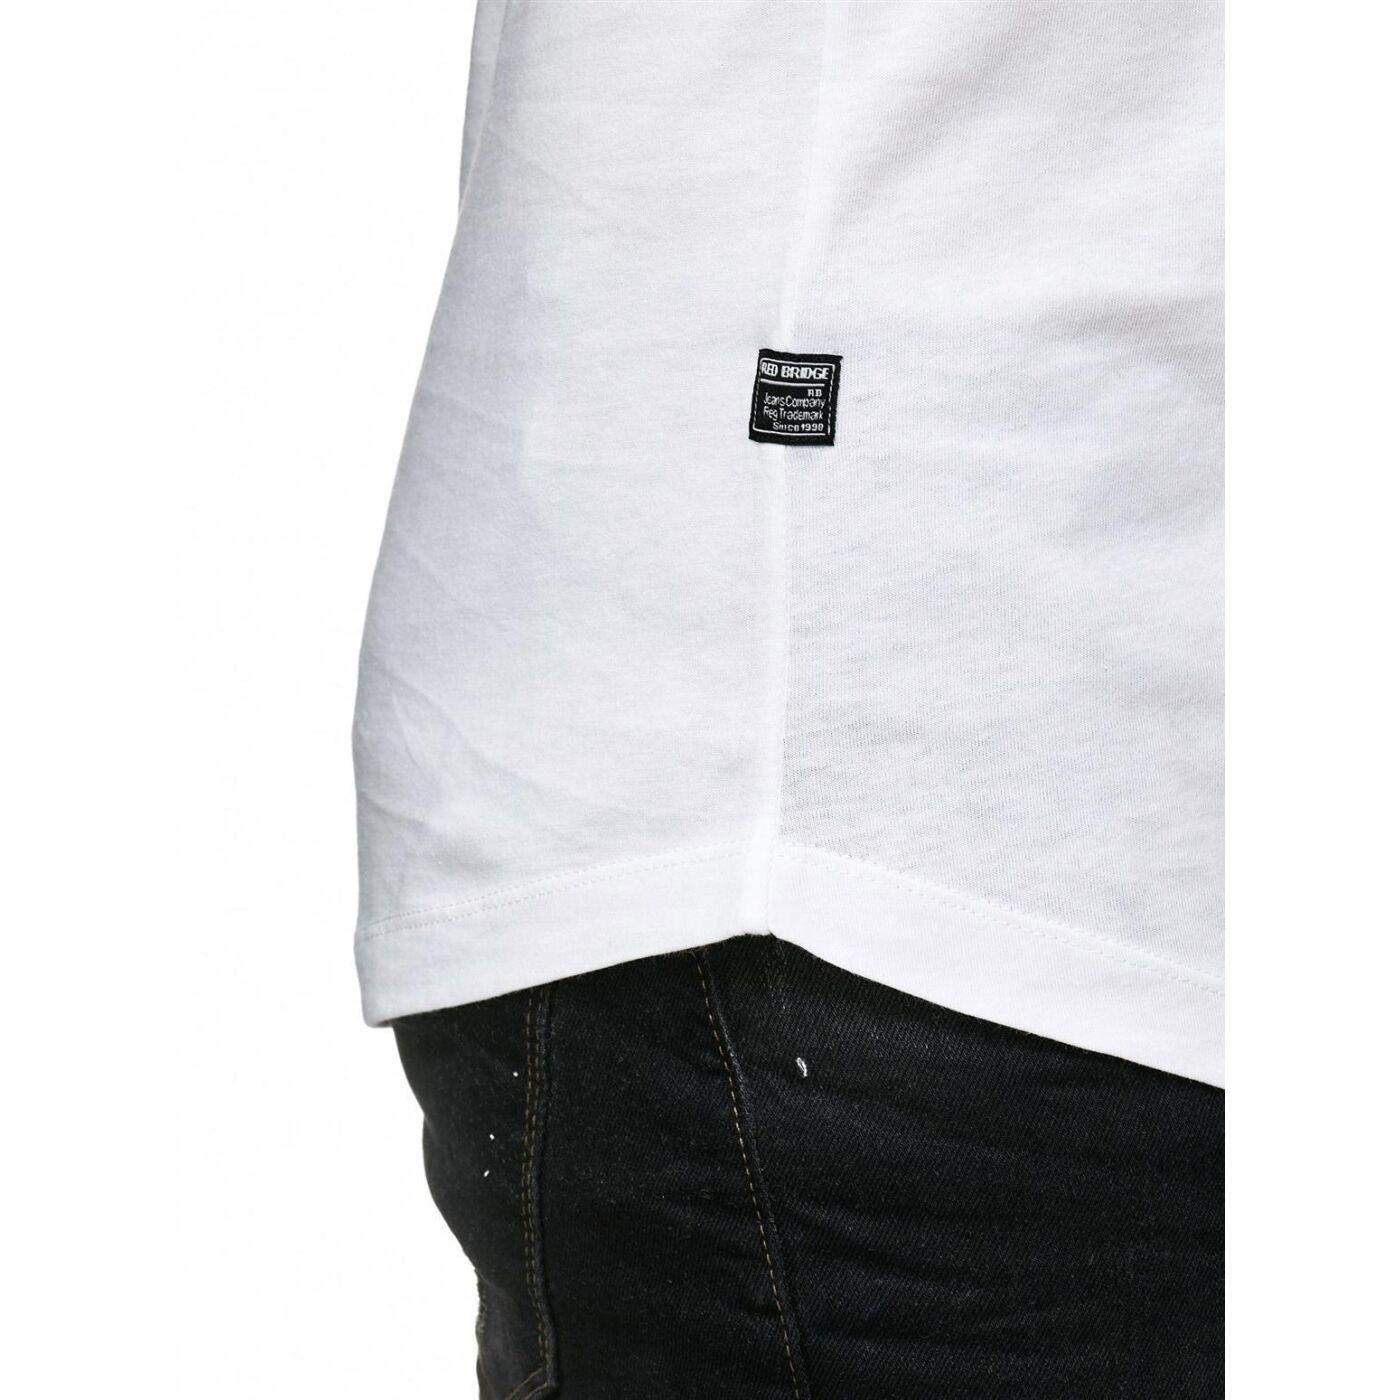 red bridge herren basic oversized t shirt weiss m1116 white 16 99. Black Bedroom Furniture Sets. Home Design Ideas